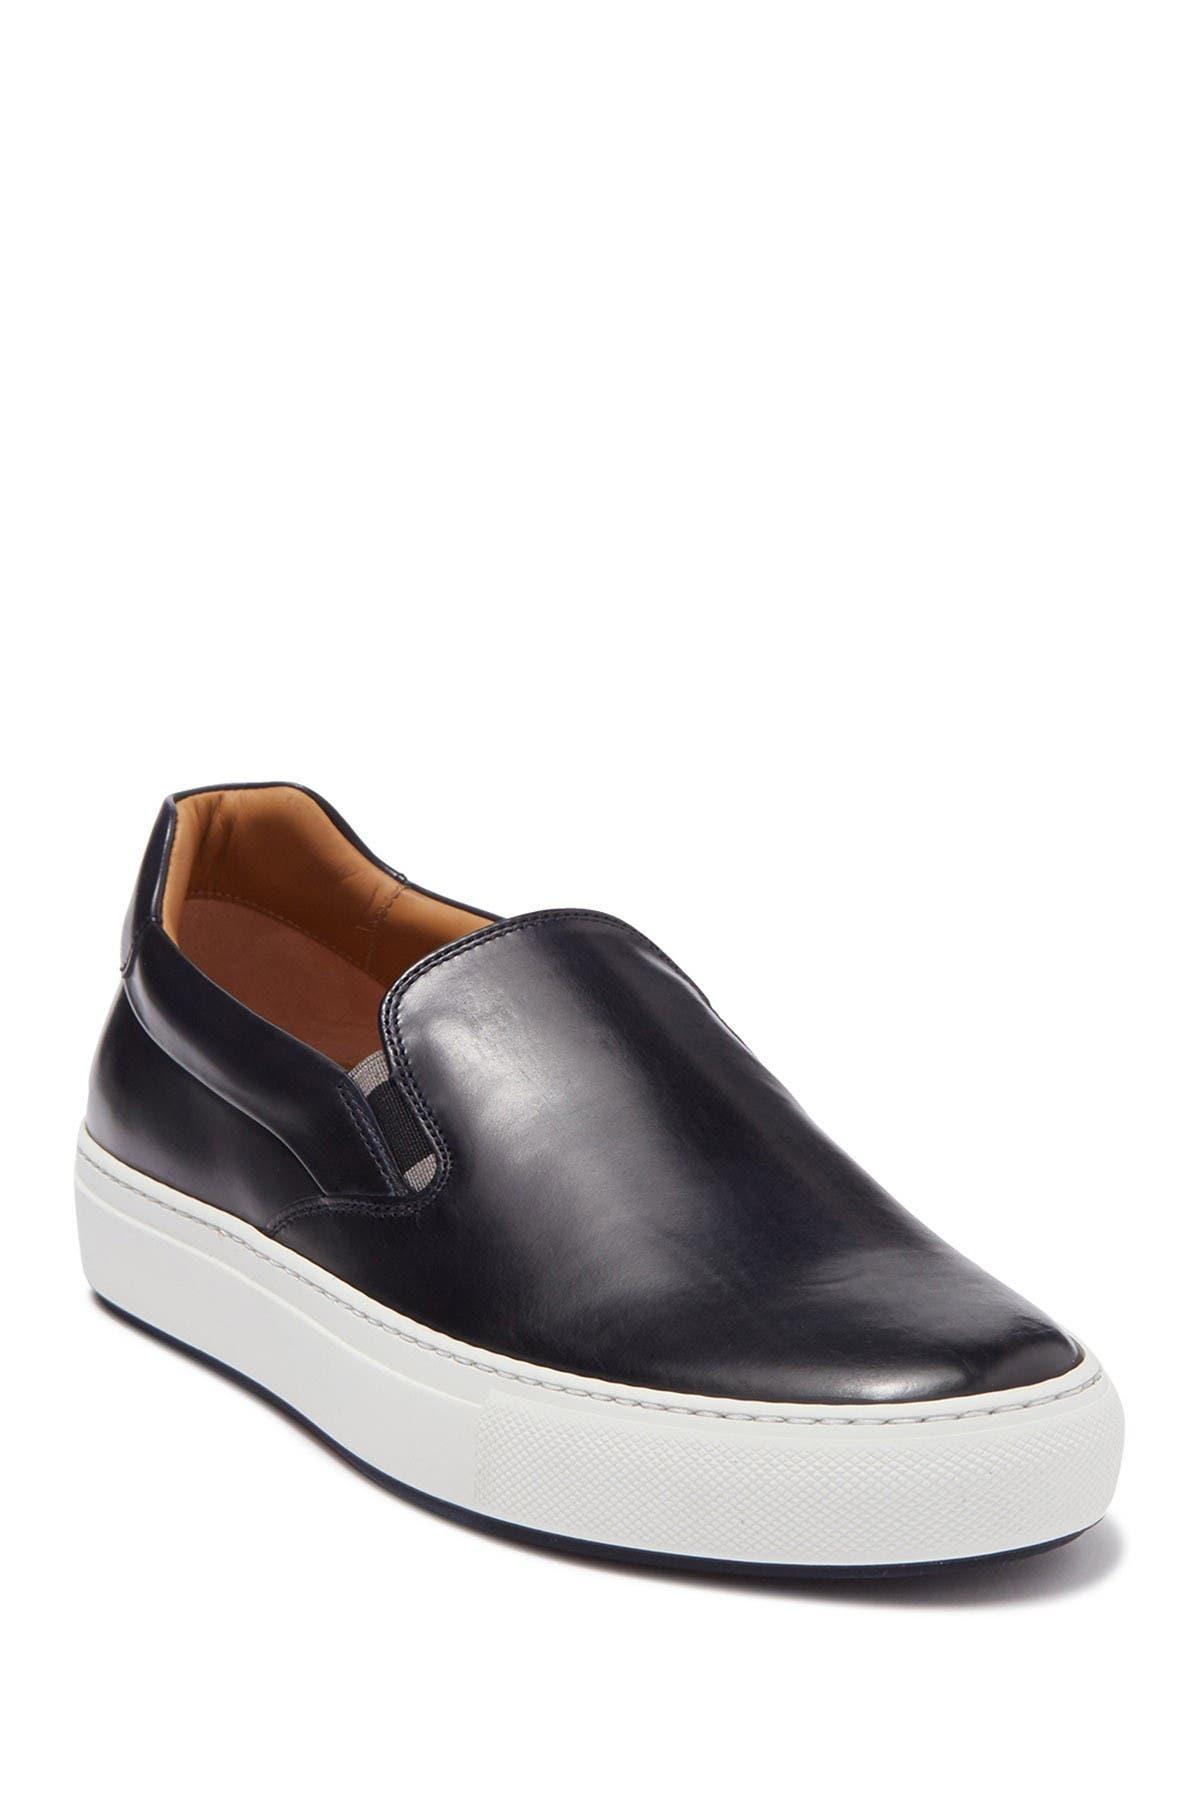 Image of BOSS Mirage Slon Slip-On Sneaker